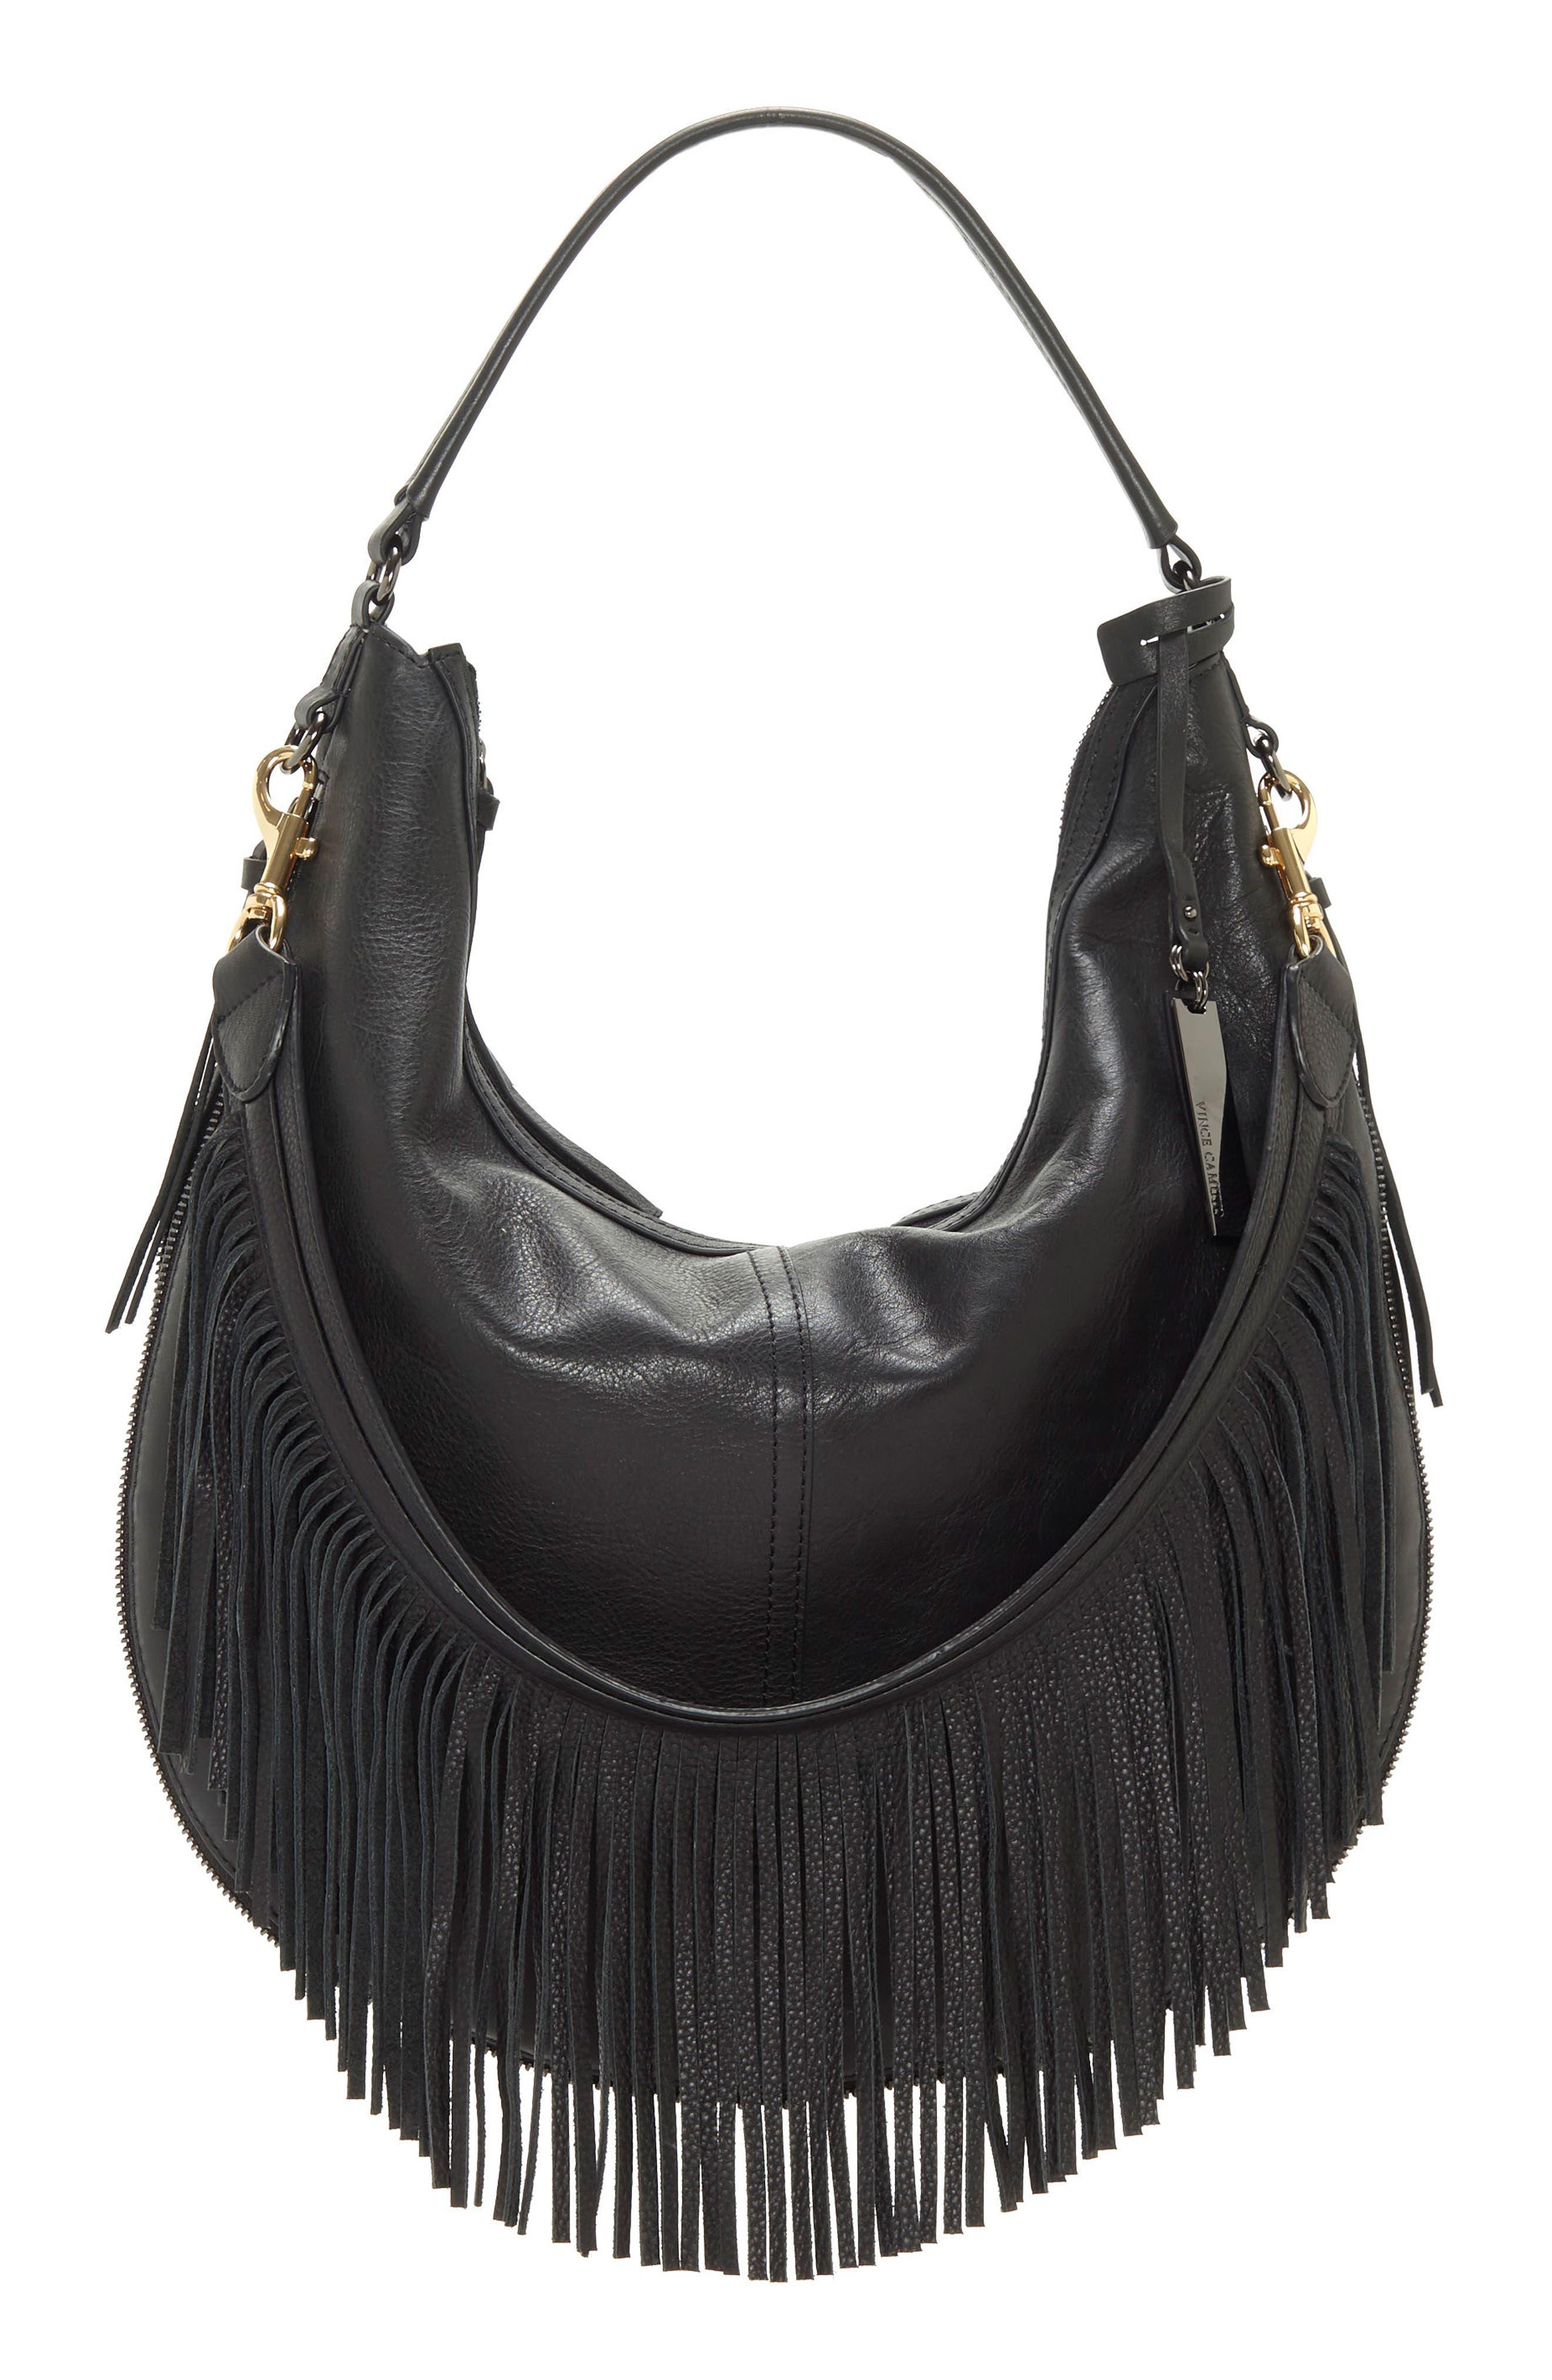 Hil Leather Hobo Bag,                         Main,                         color, 002